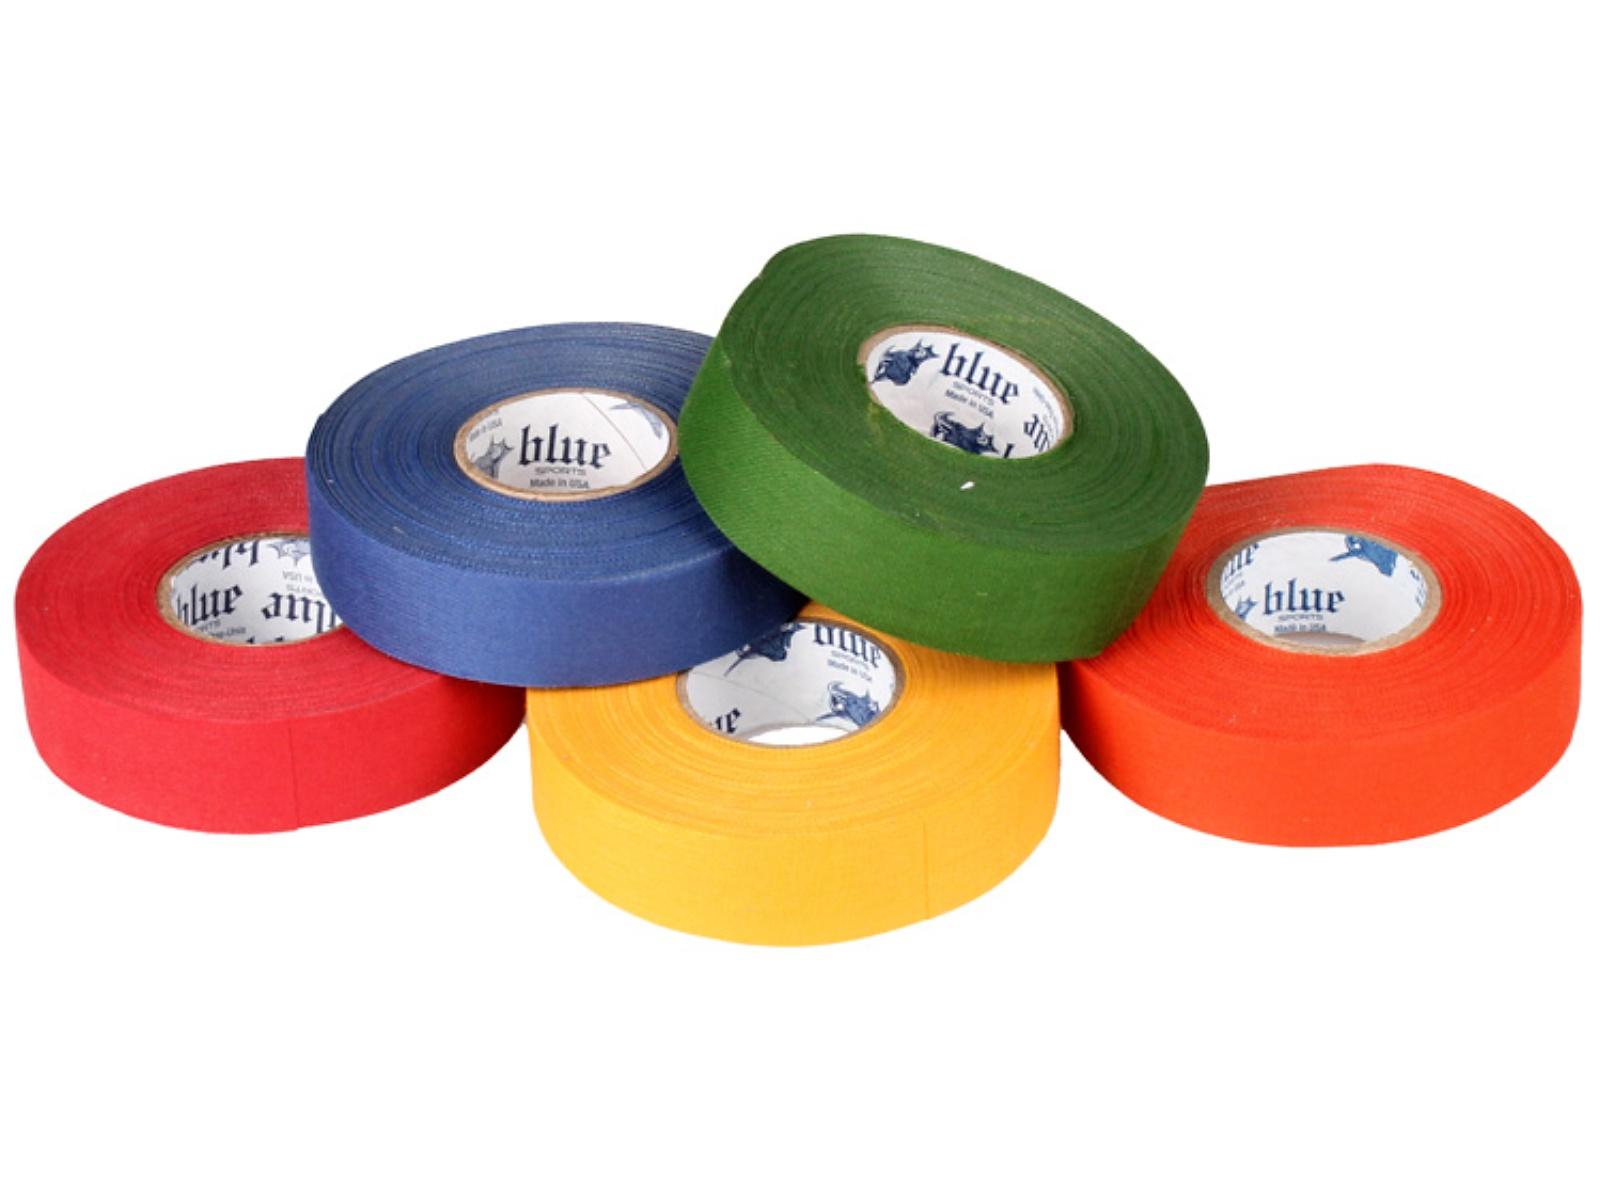 Hokejová páska BLUE Sport 25 m x 2,4 cm, netrhací - modrá